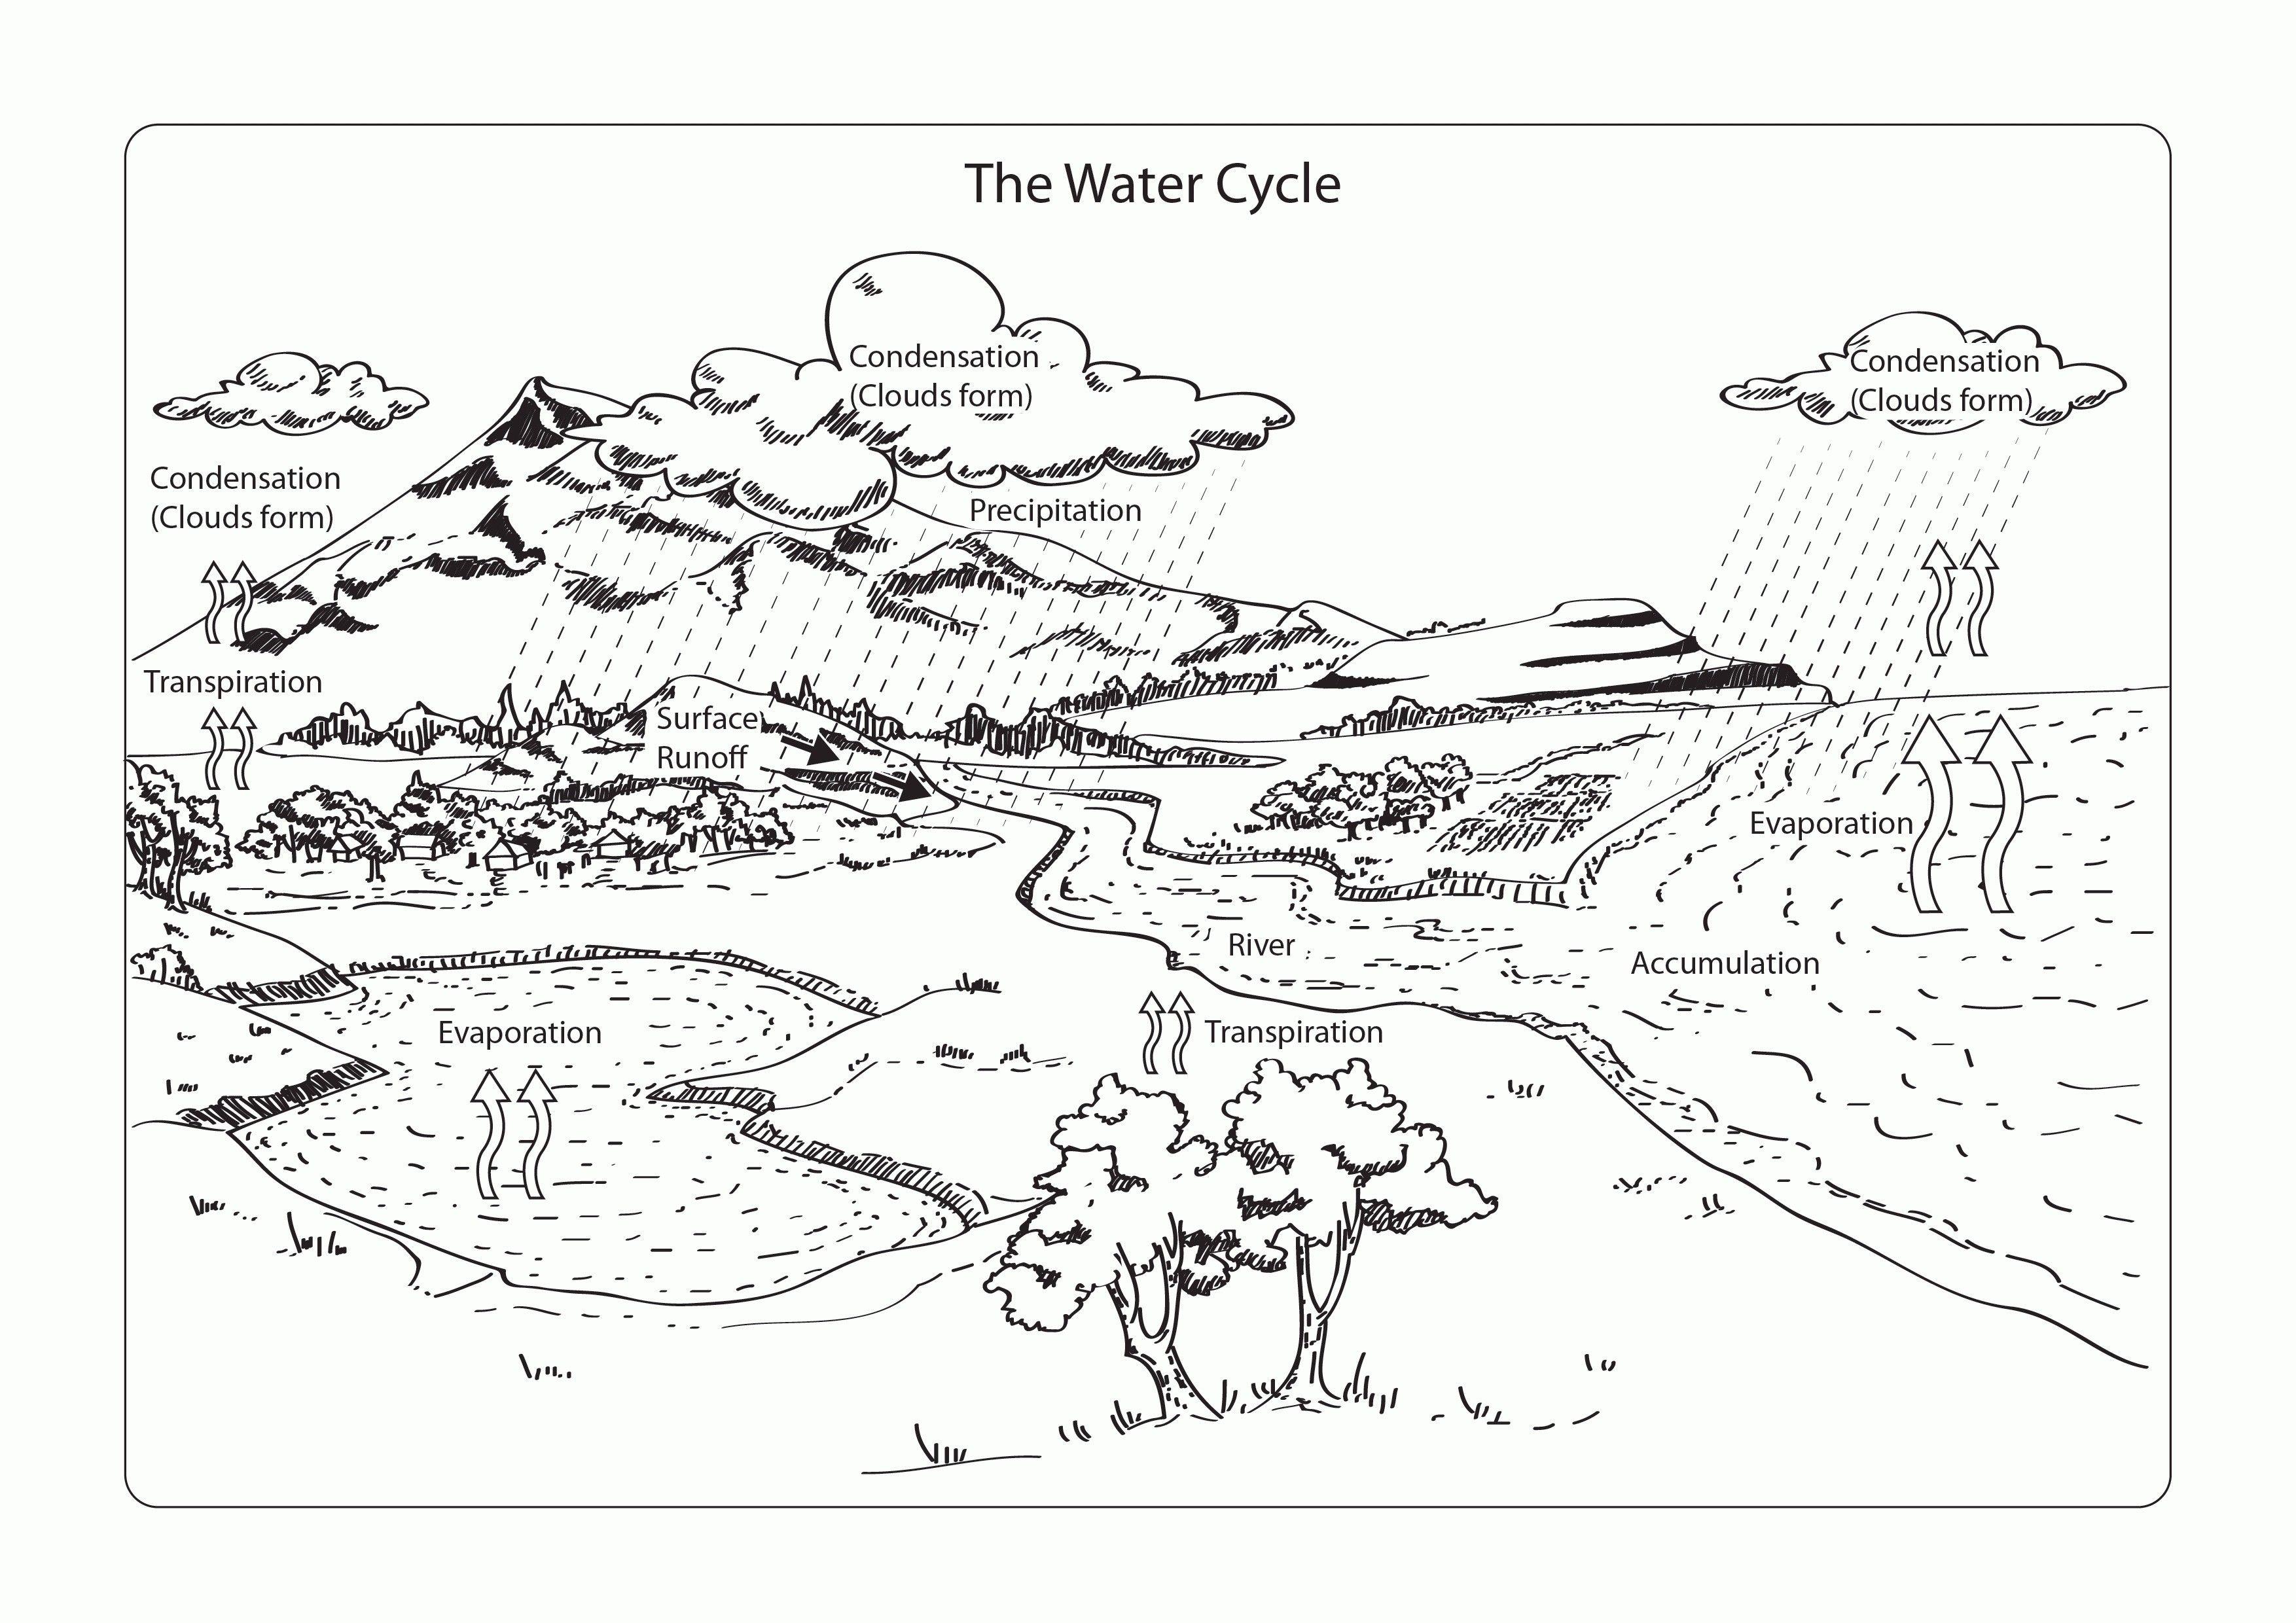 Water Cycle Coloring Page Water Cycle Coloring Page